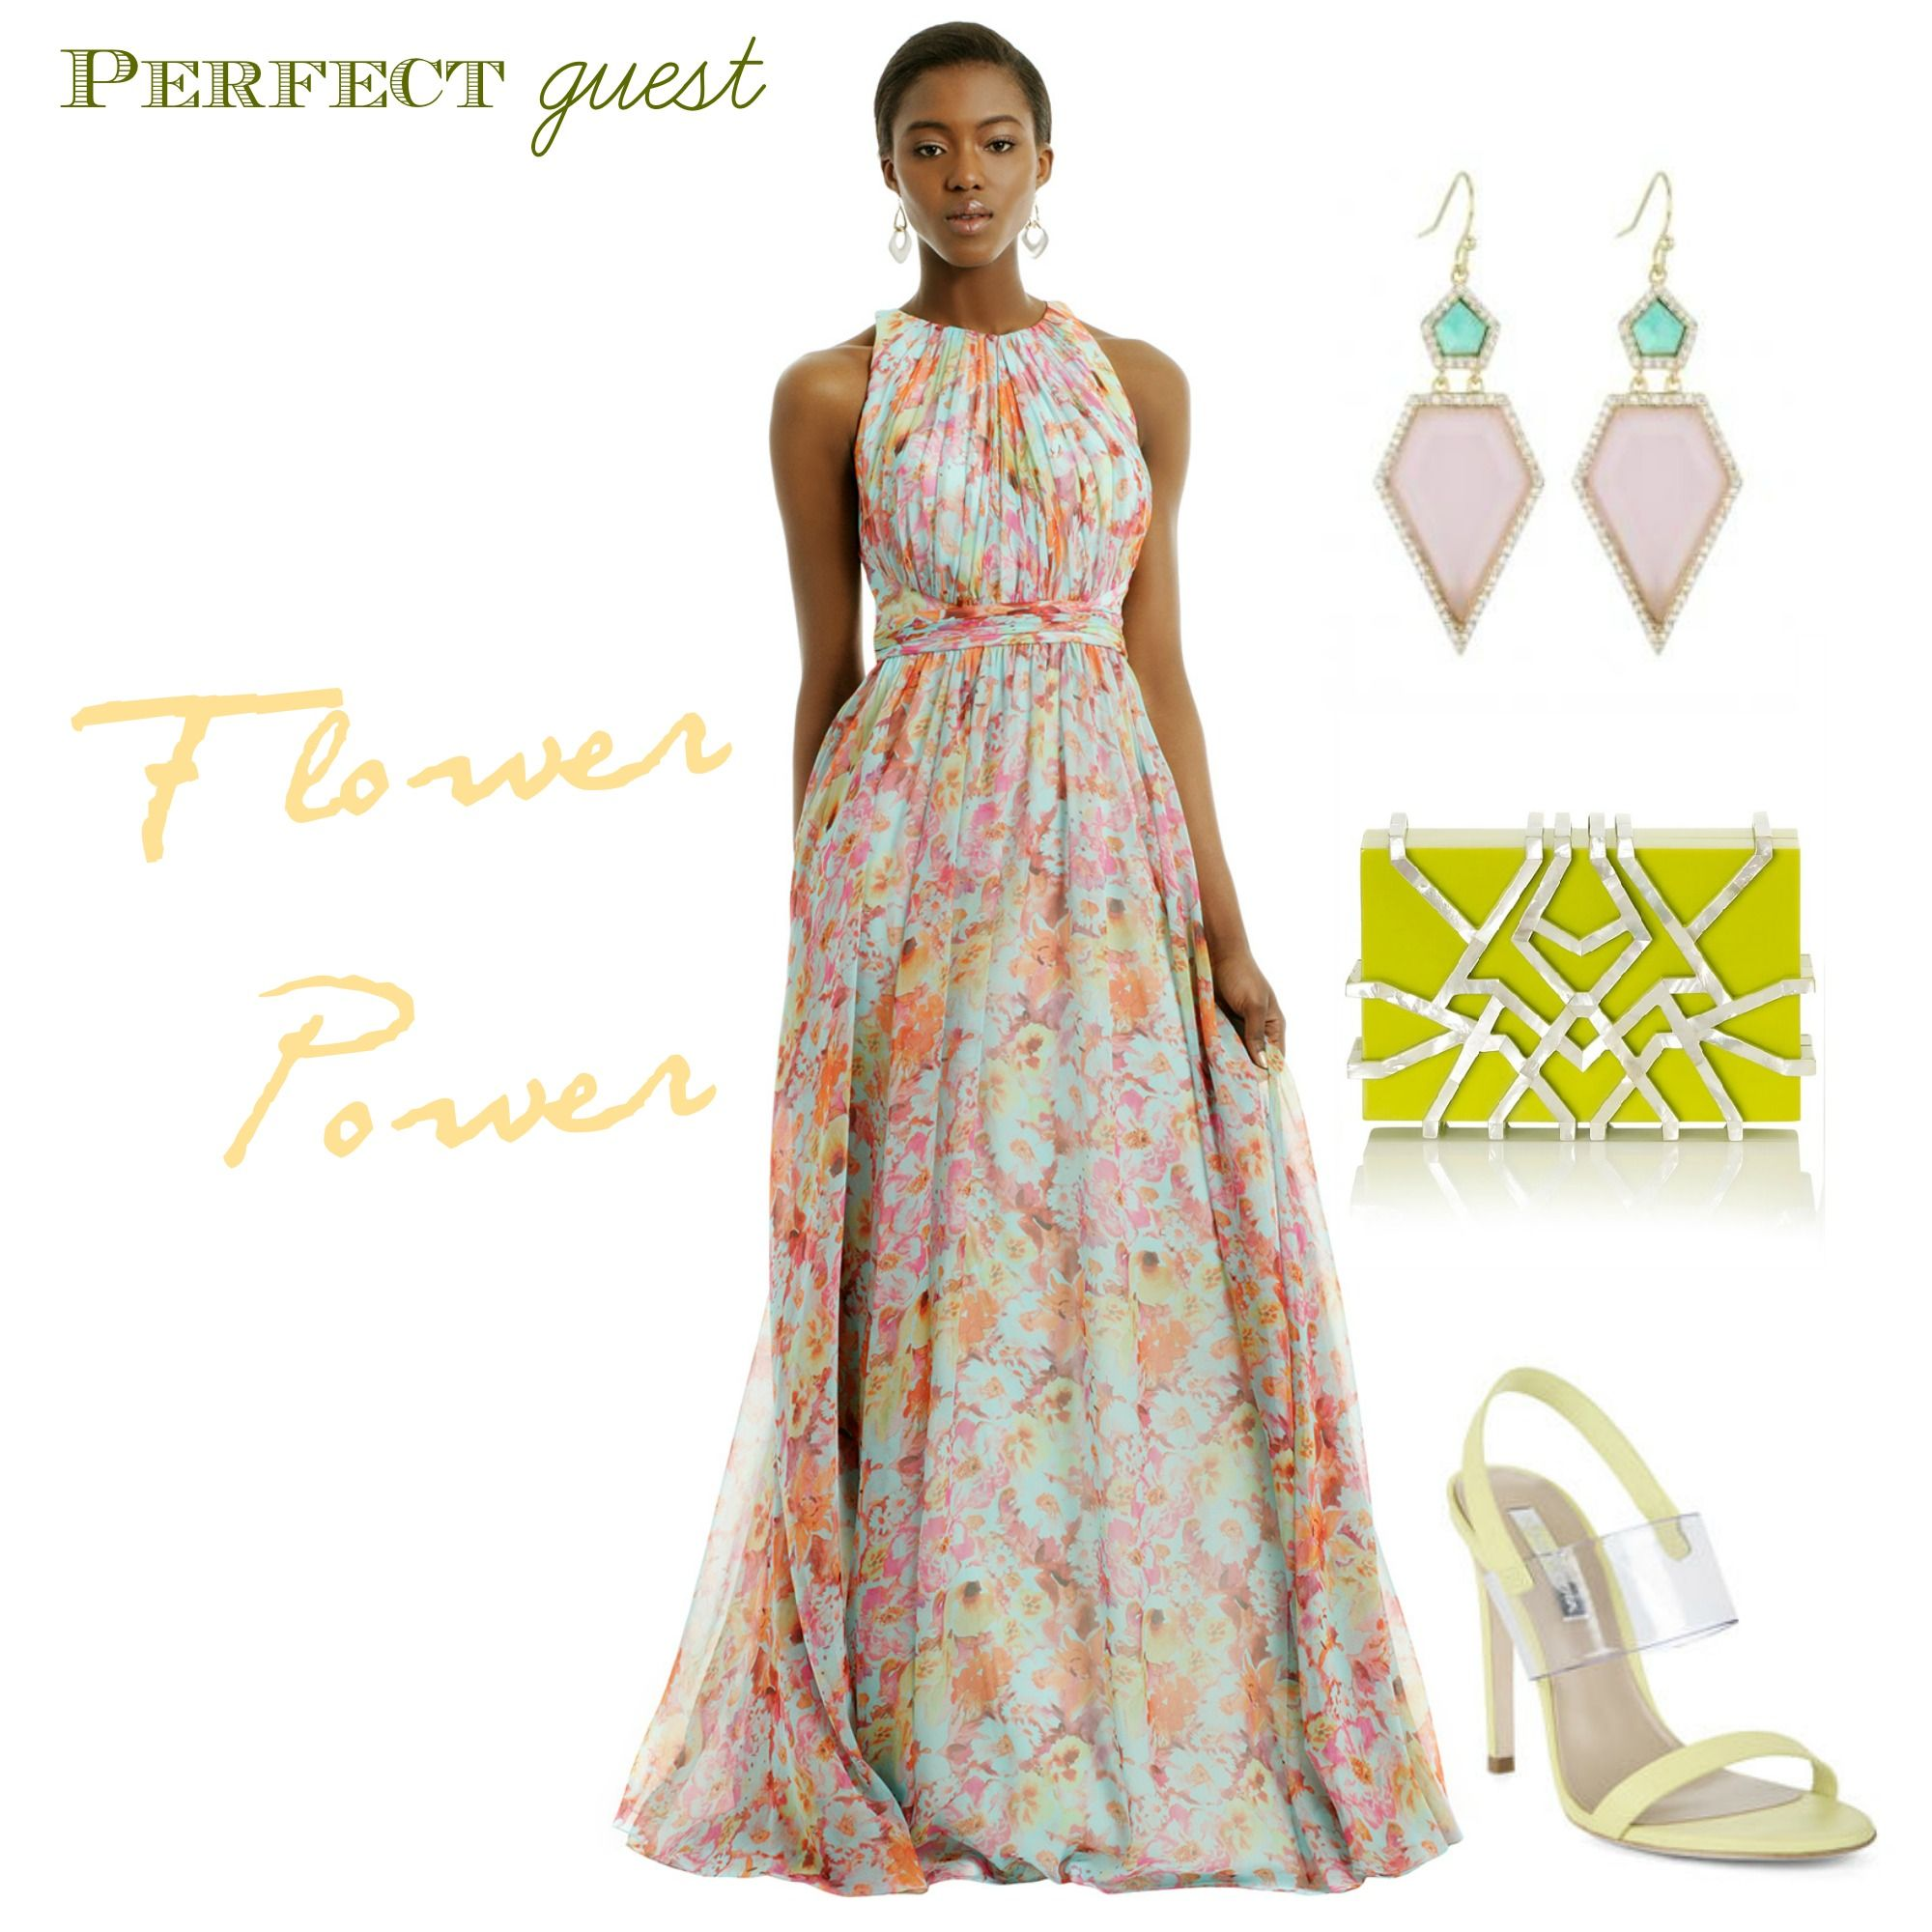 Pin By F D Reina On What To Wear Summer Wedding Outfits Maxi Dress Wedding Guest Maxi Dress Wedding Dressy Maxi Dress [ 2000 x 2000 Pixel ]